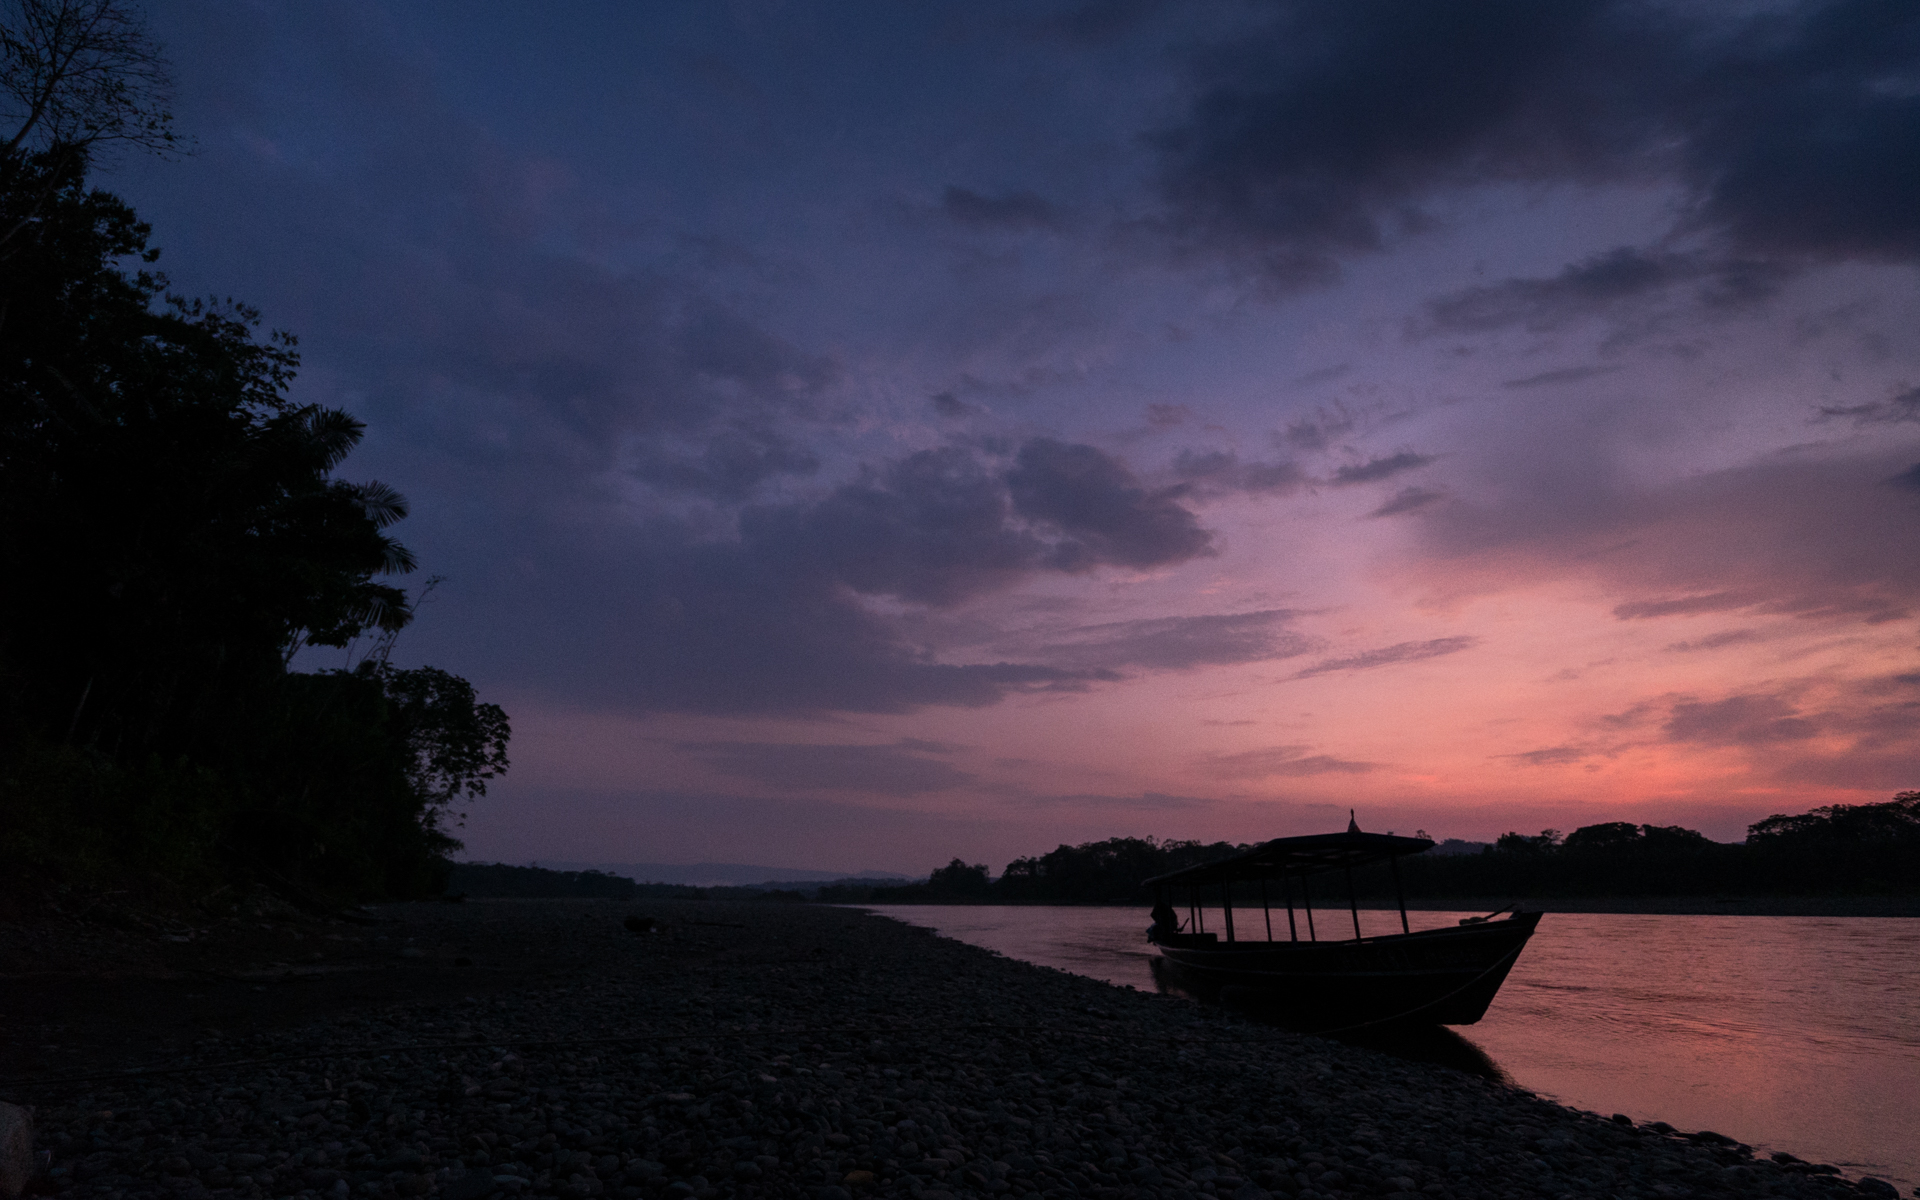 pink-sunrise-jone-troconis-3959.jpg